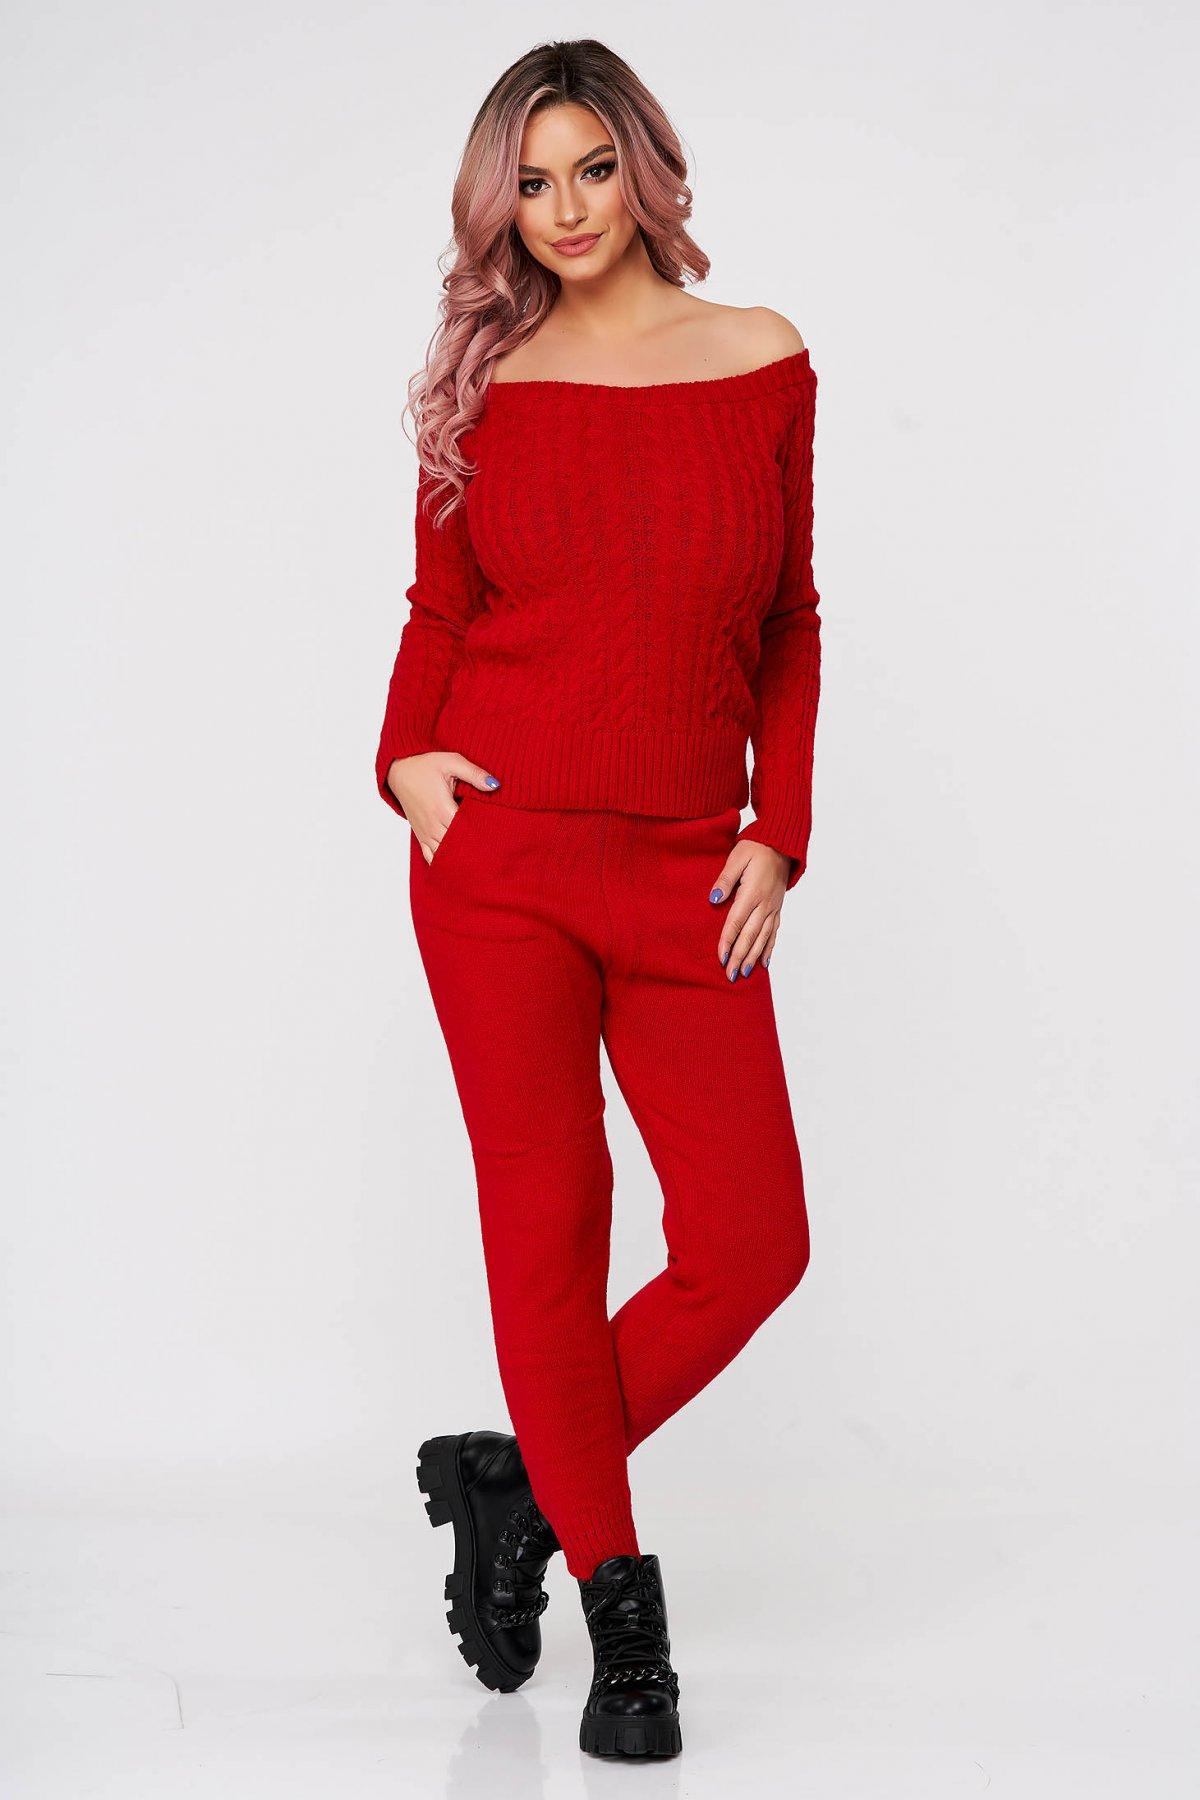 Trening dama SunShine rosu casual tricotat cu material impletit din doua piese imagine